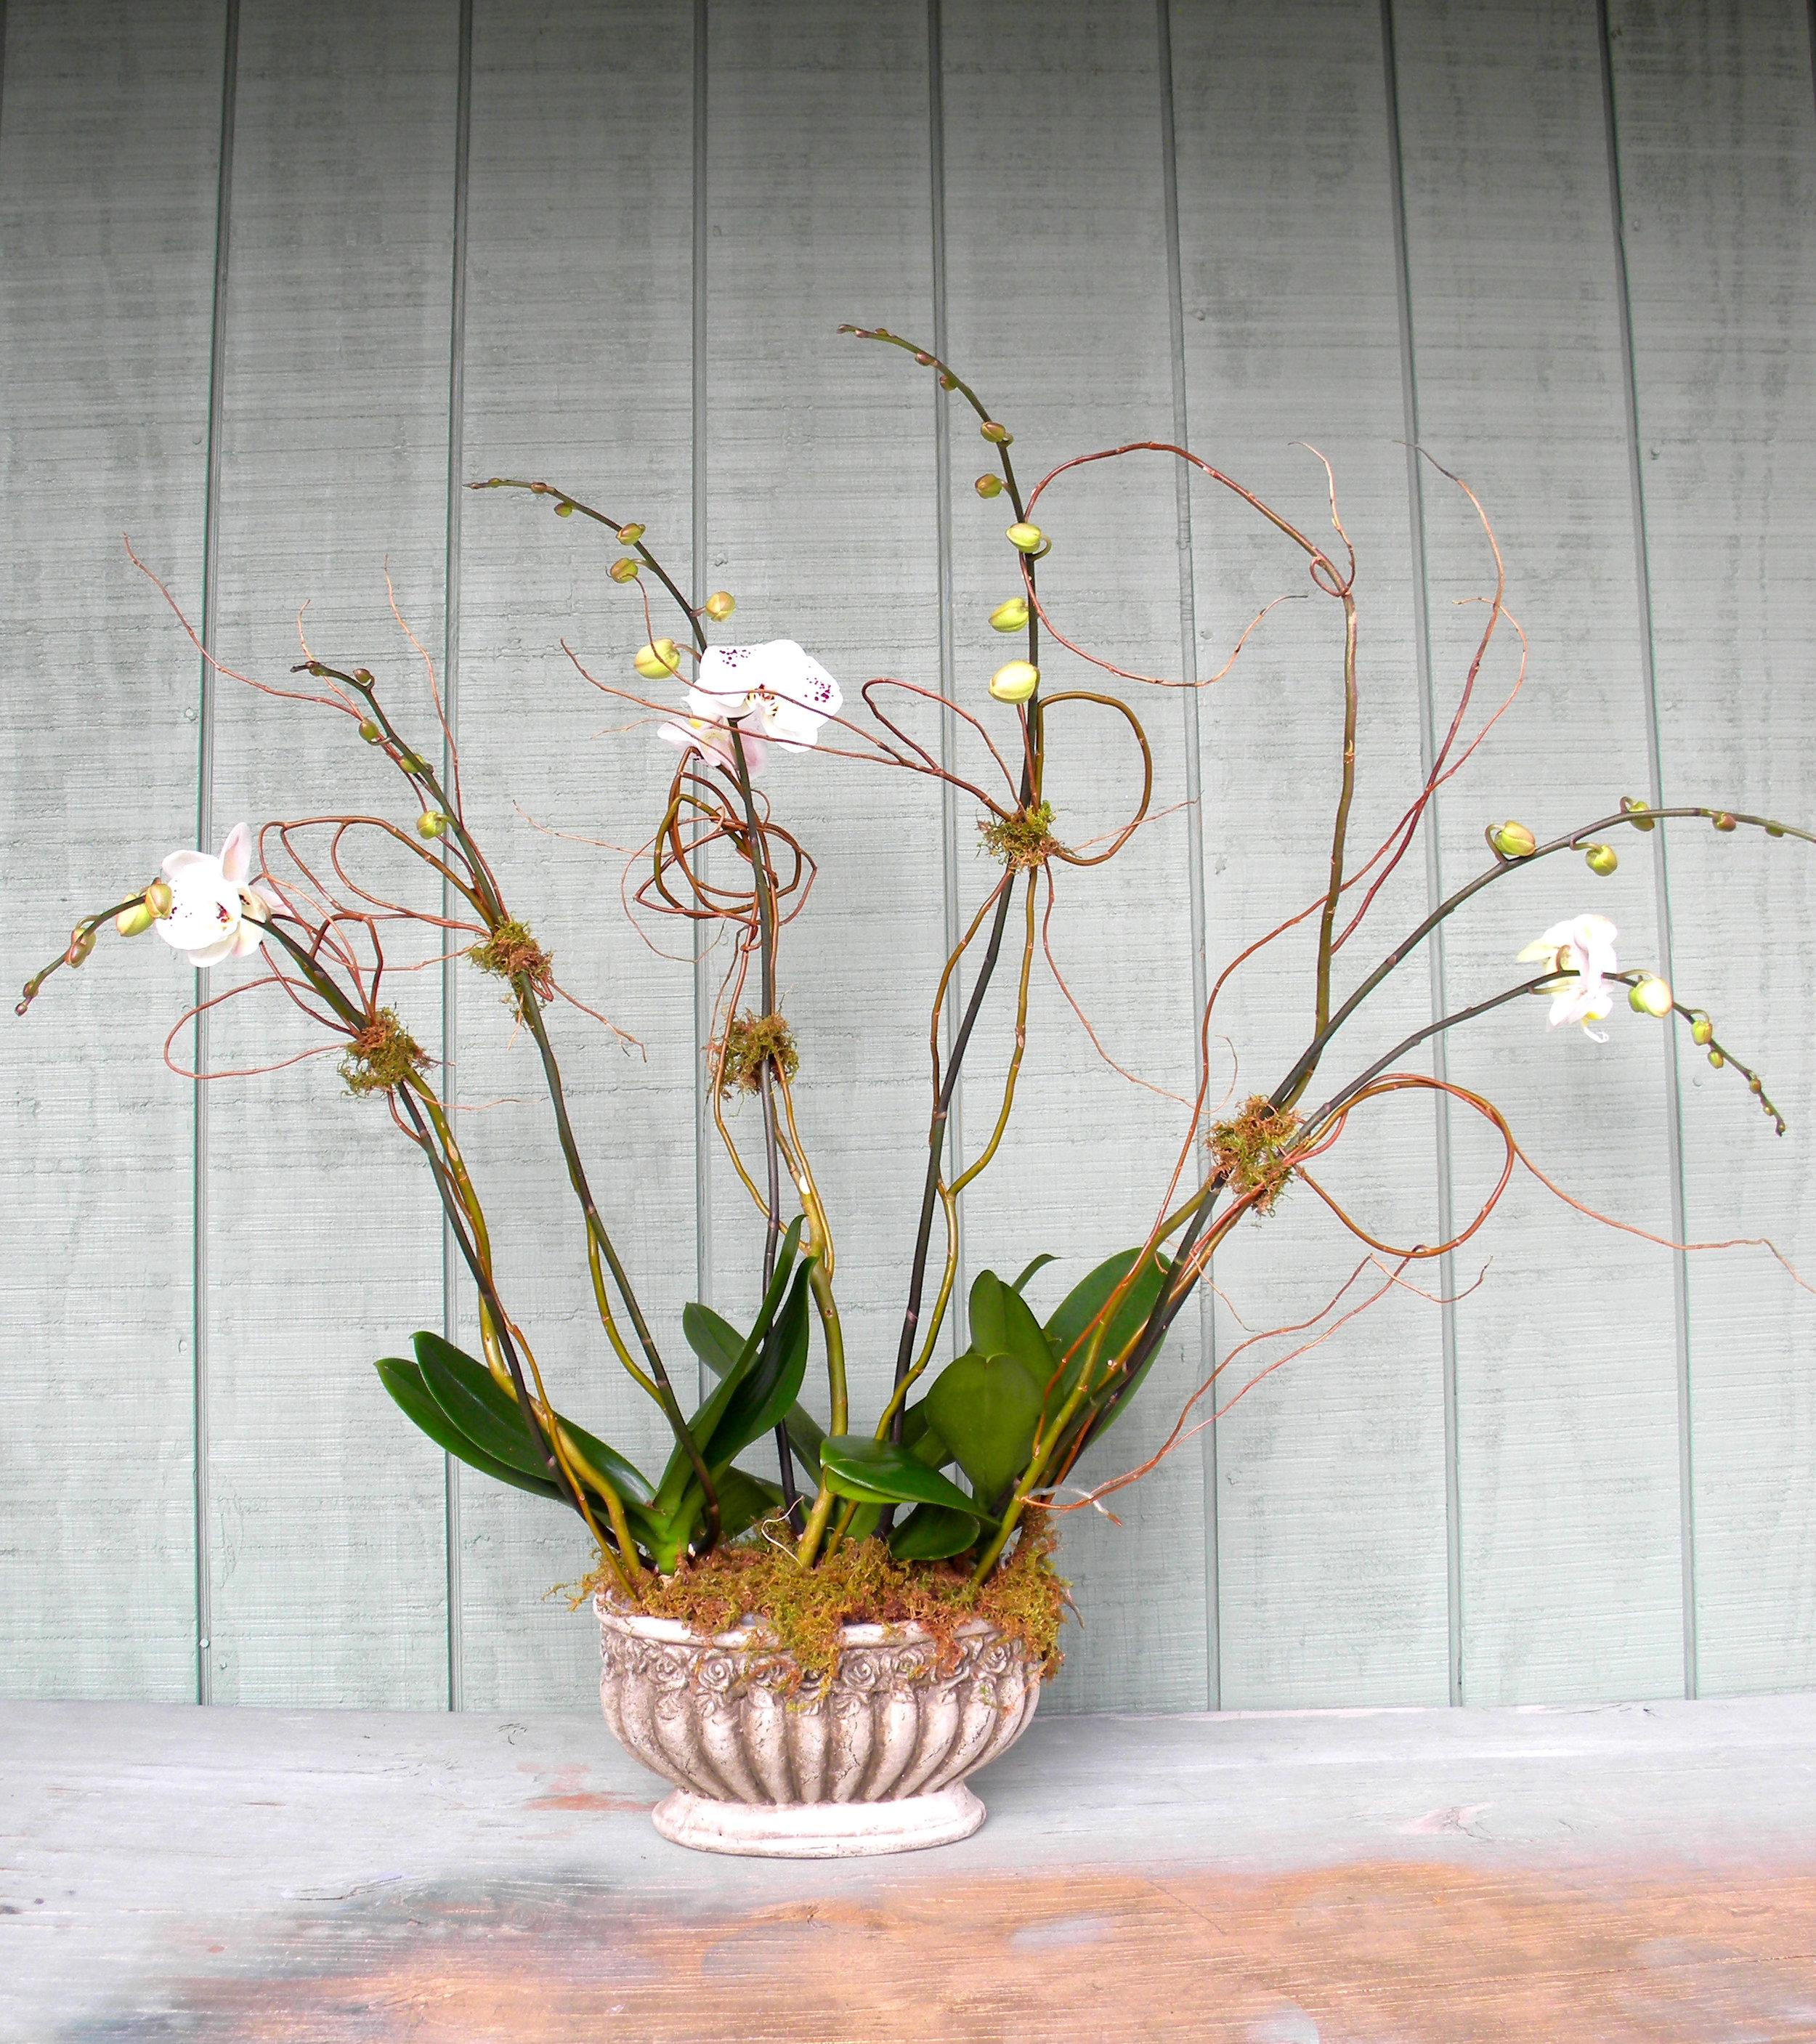 150dollar orchid.jpg